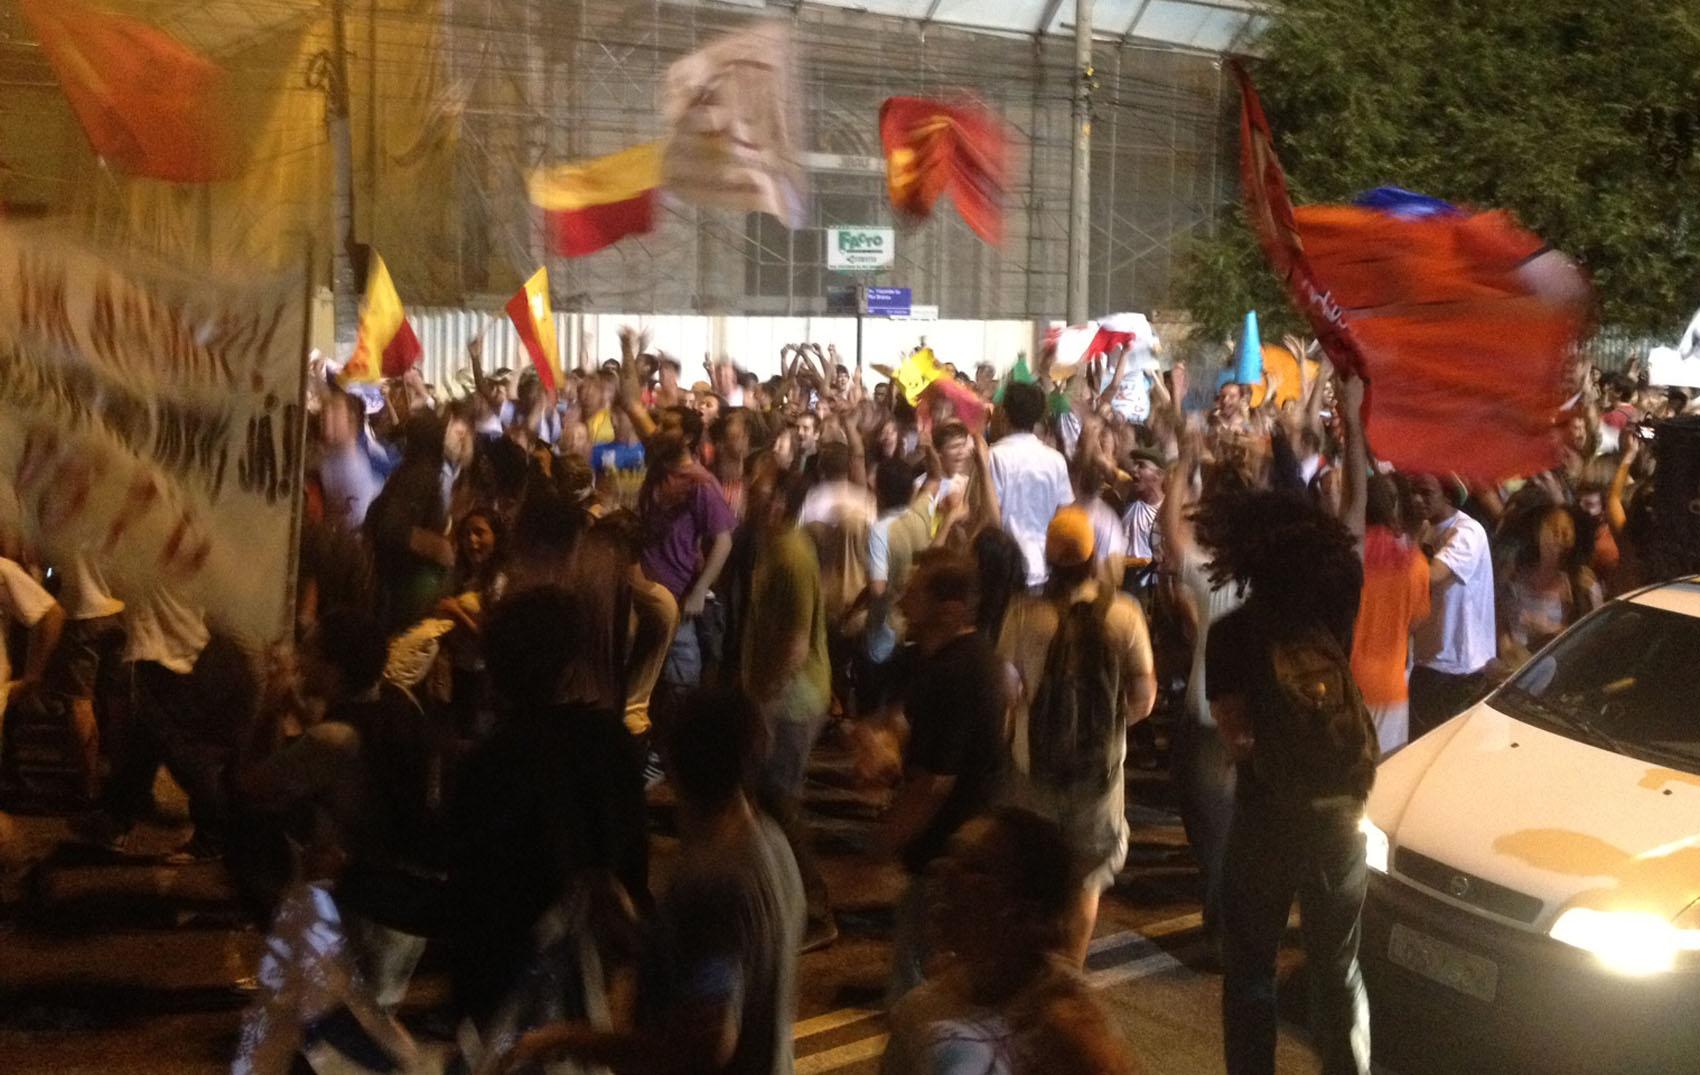 Ruas de Niterói são interditadas por conta de protesto contra tarifa de ônibus